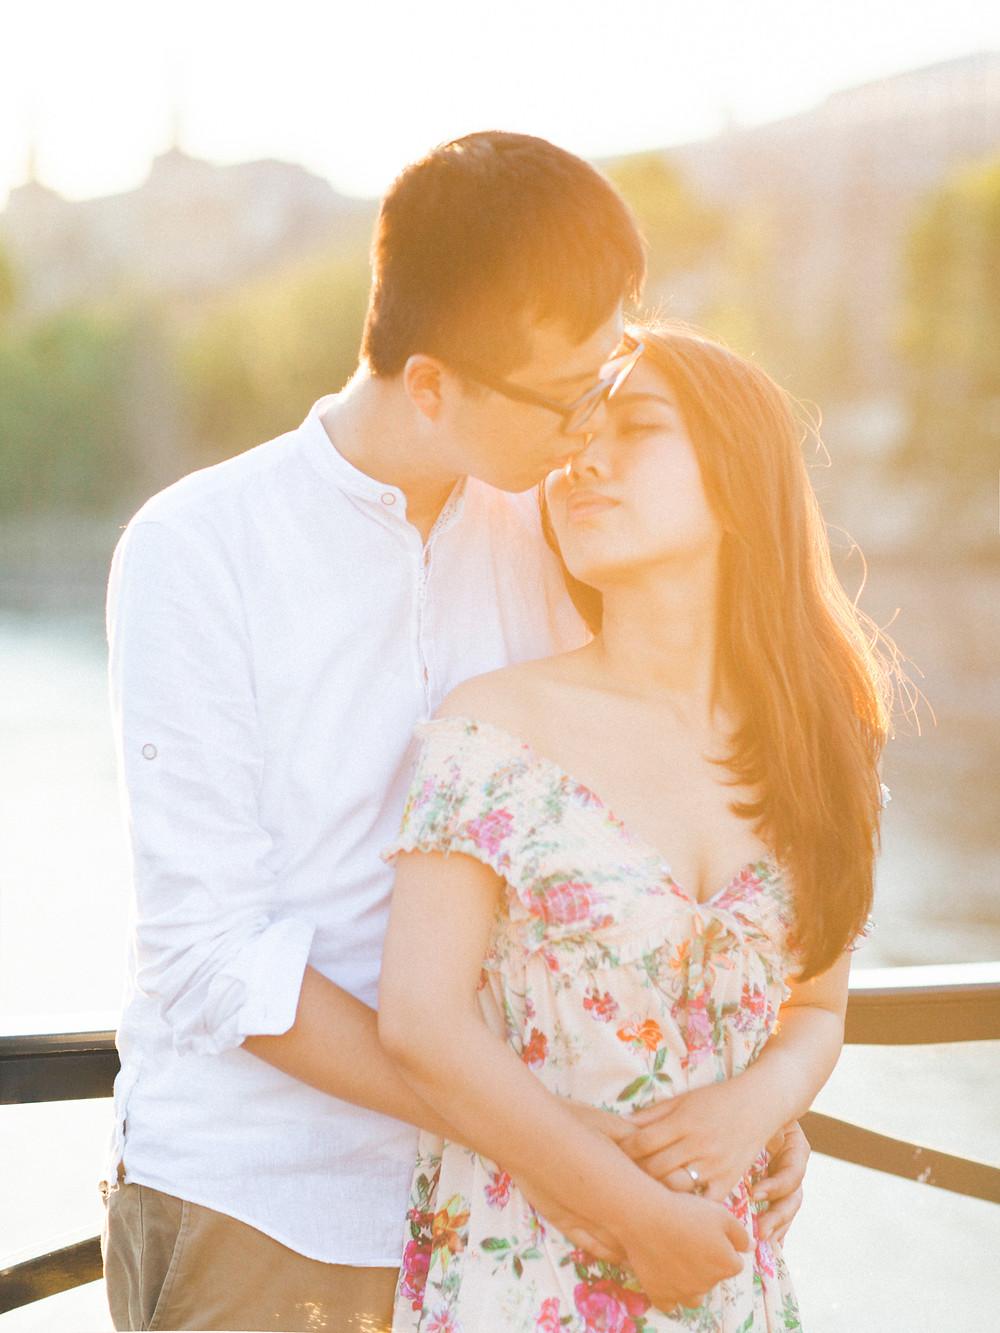 Lulu & Yoyo Engagement in Paris & Provence 法國普羅旺斯&巴黎婚紗 Arther Chen Photography美式婚紗